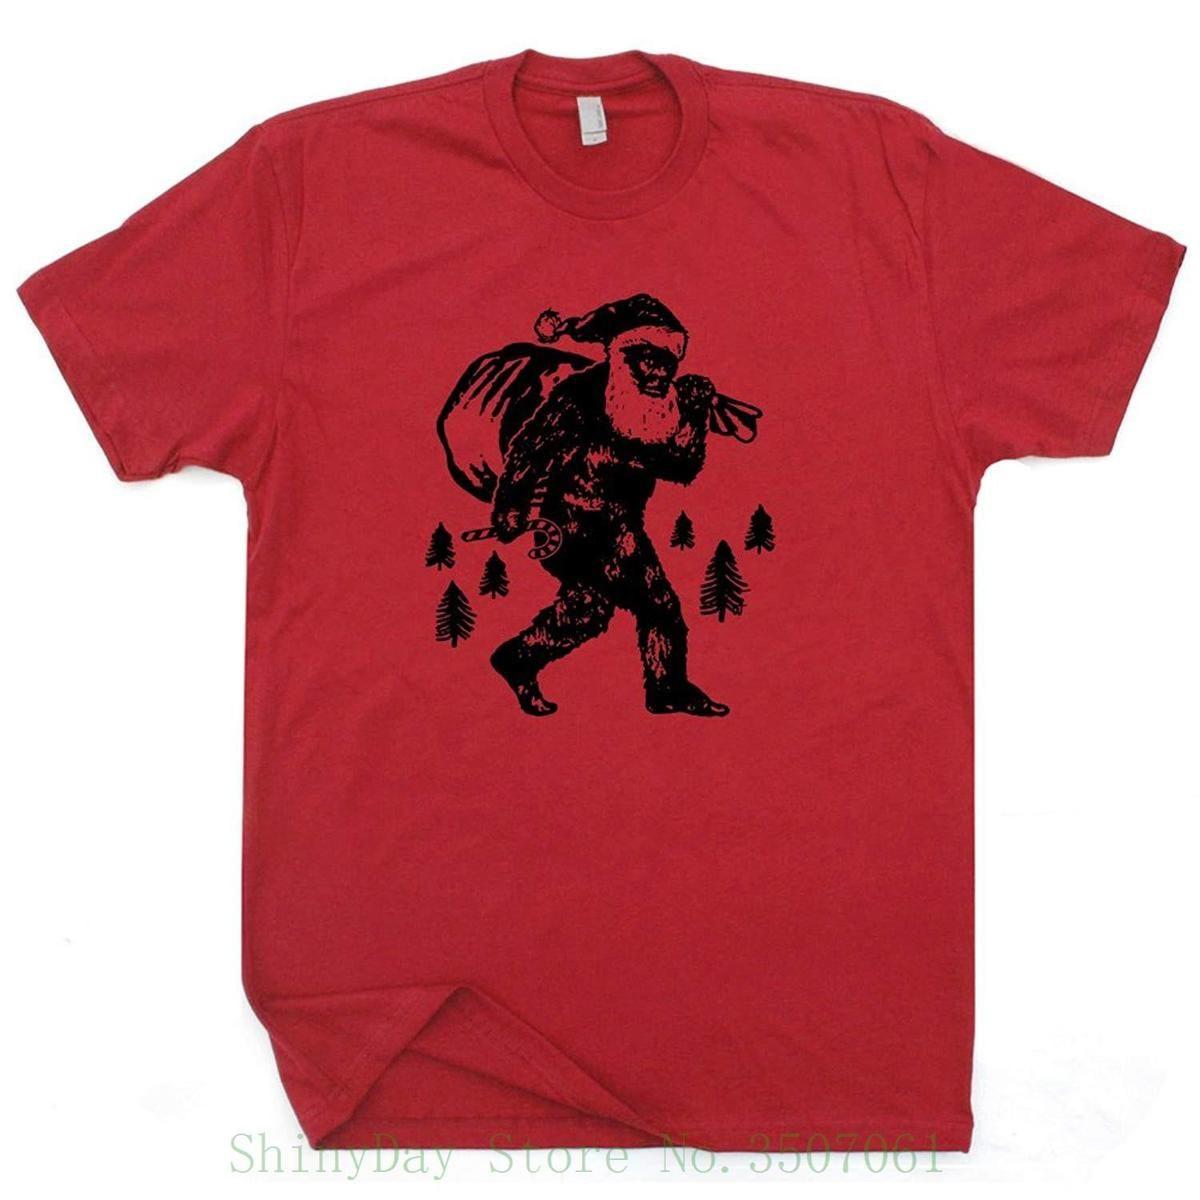 Sasquatch Santa Clause T Shirt Funny Christmas Shirts Bigfoot Tee ...